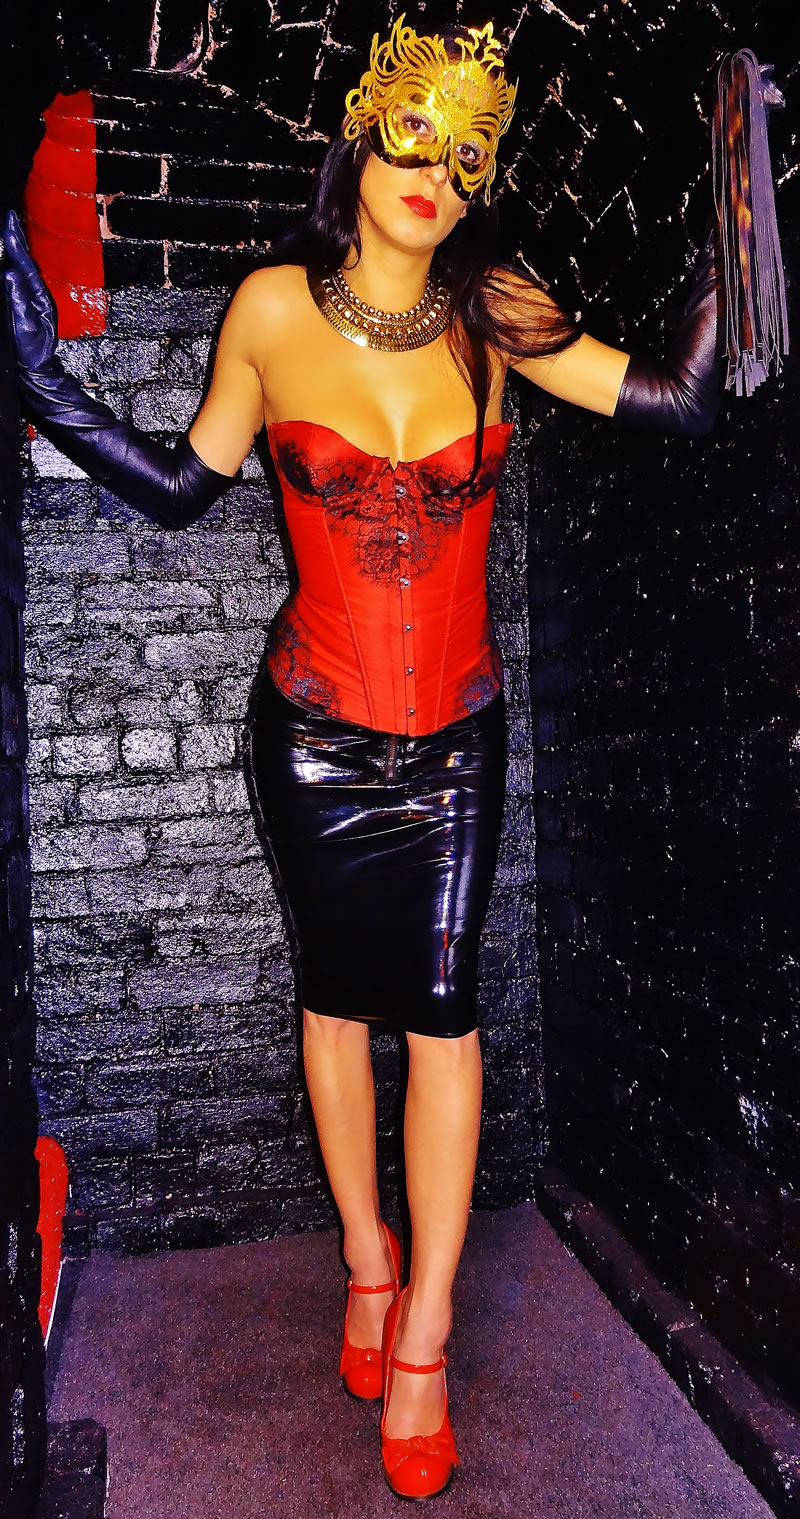 birmingham-mistress-03138